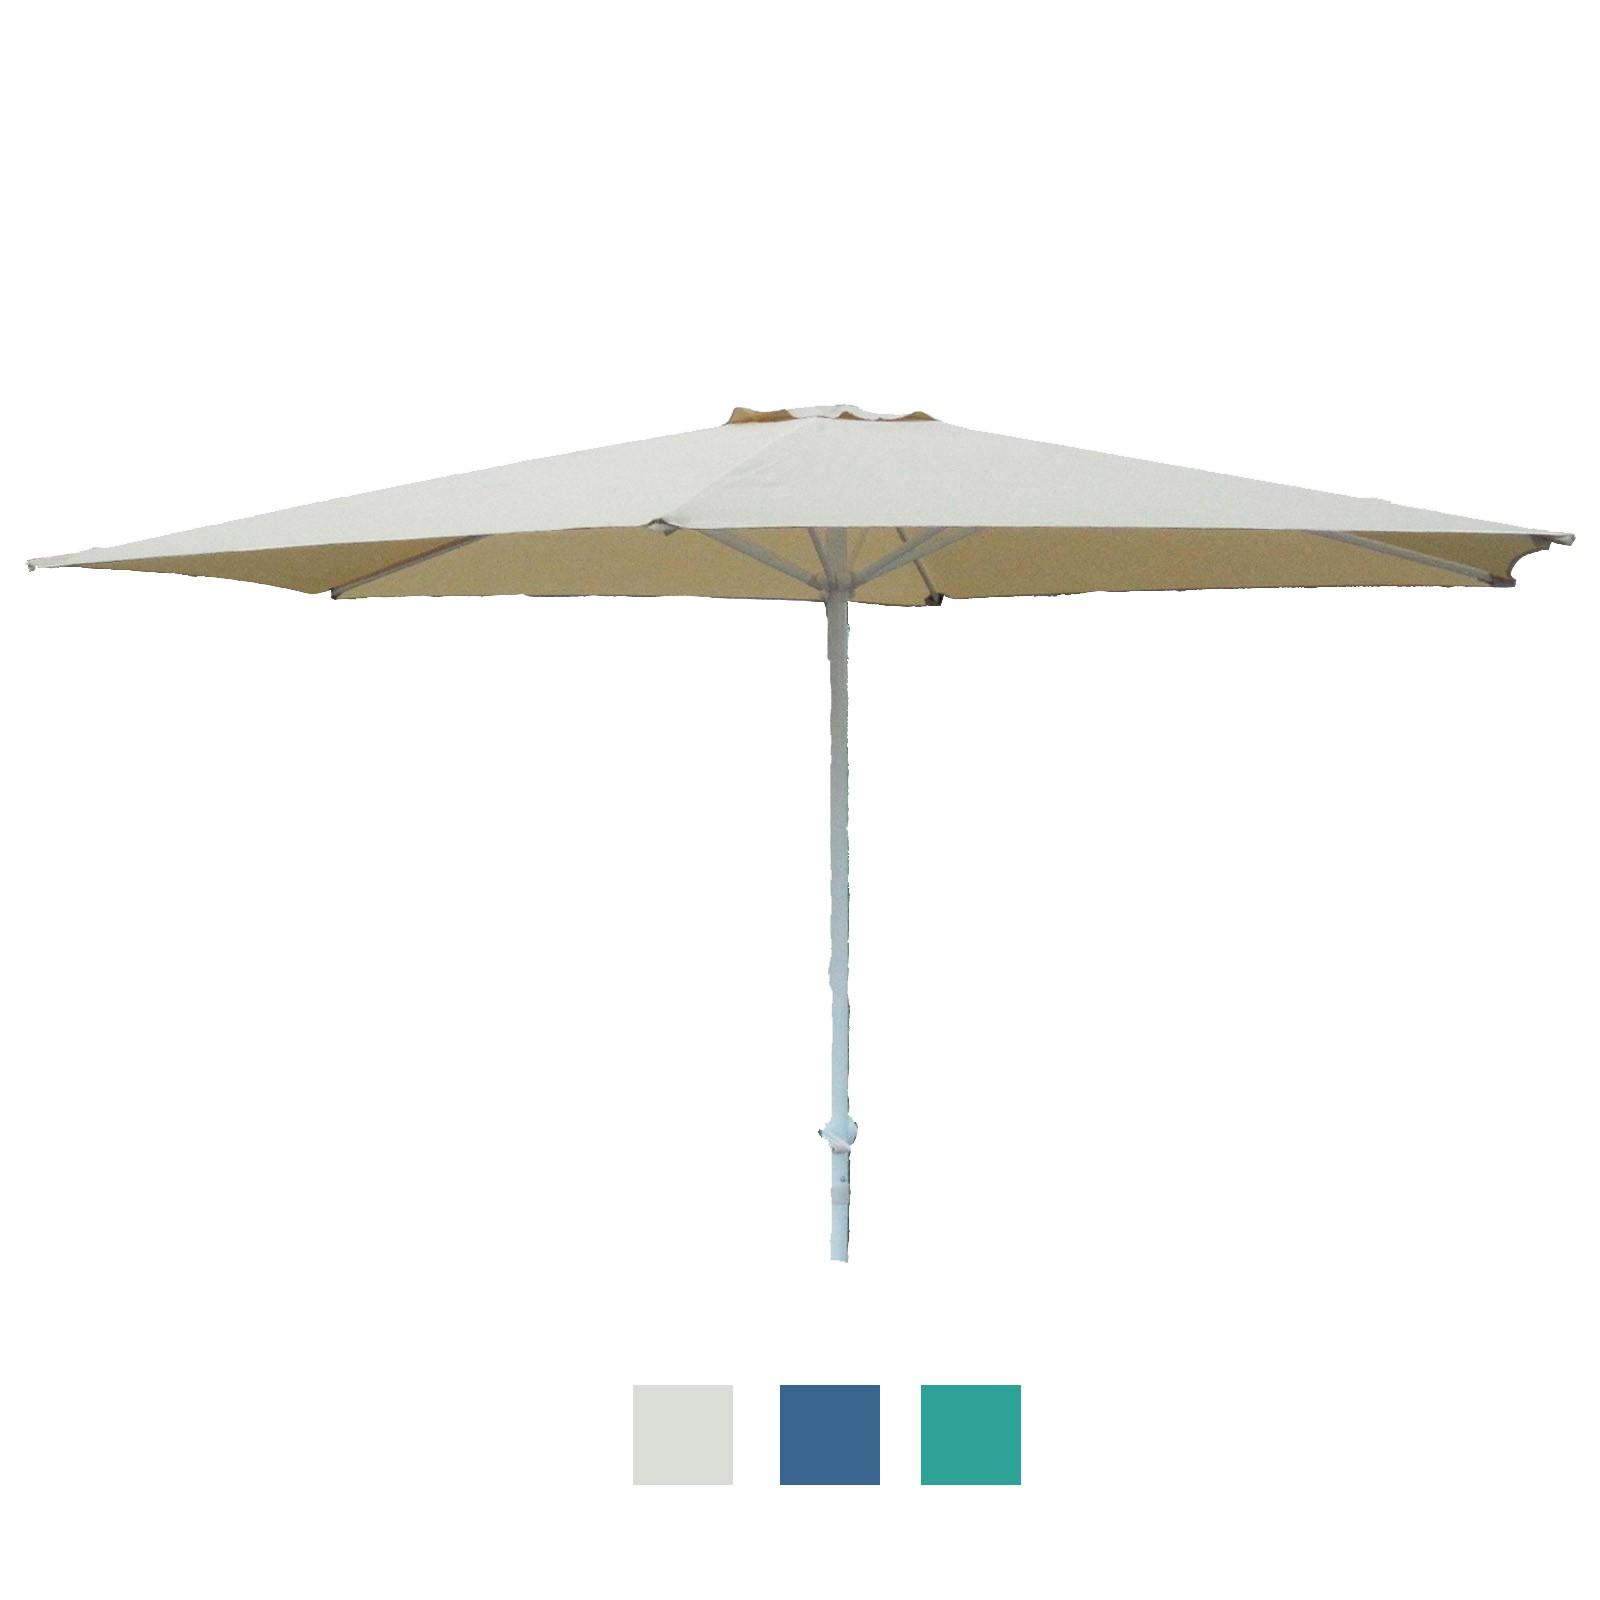 marktschirm sonnenschirm 300 cm mit kurbel gartenschirm schirm sonnenschutz ebay. Black Bedroom Furniture Sets. Home Design Ideas